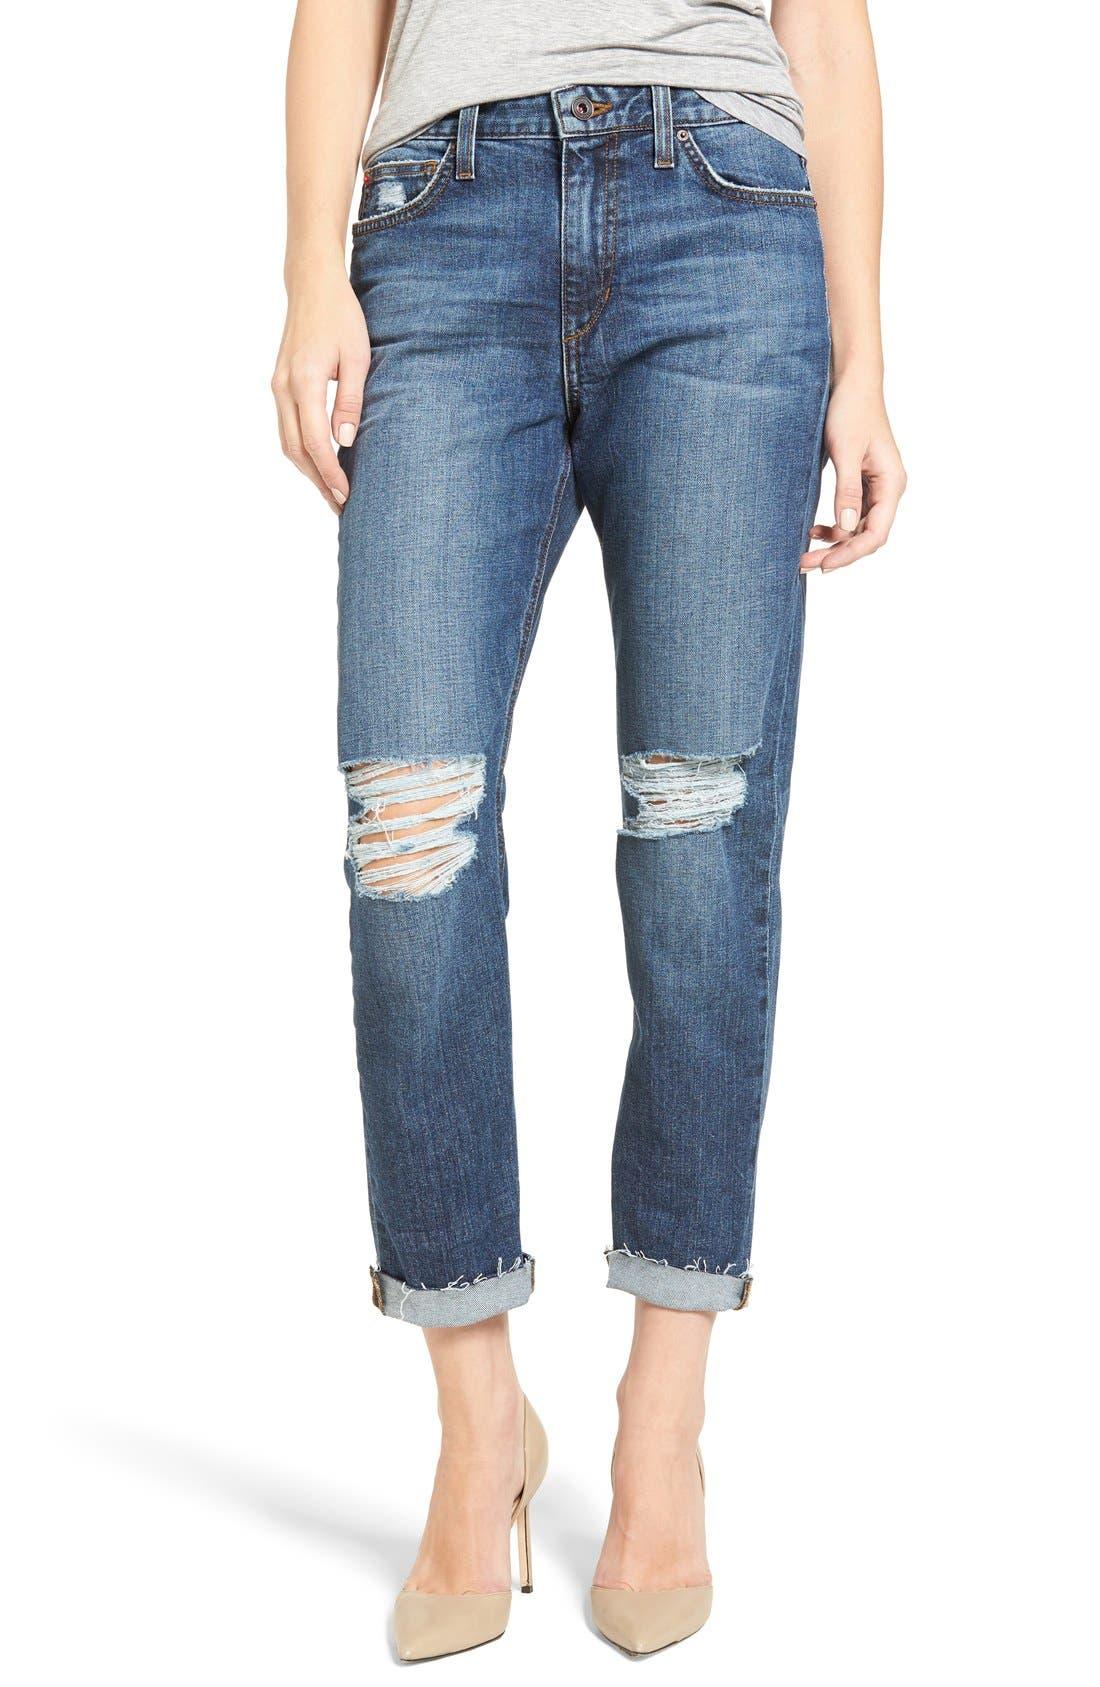 Alternate Image 1 Selected - Joes Jeans Debbie High Waist Ripped Boyfriend Jeans (Coppola)